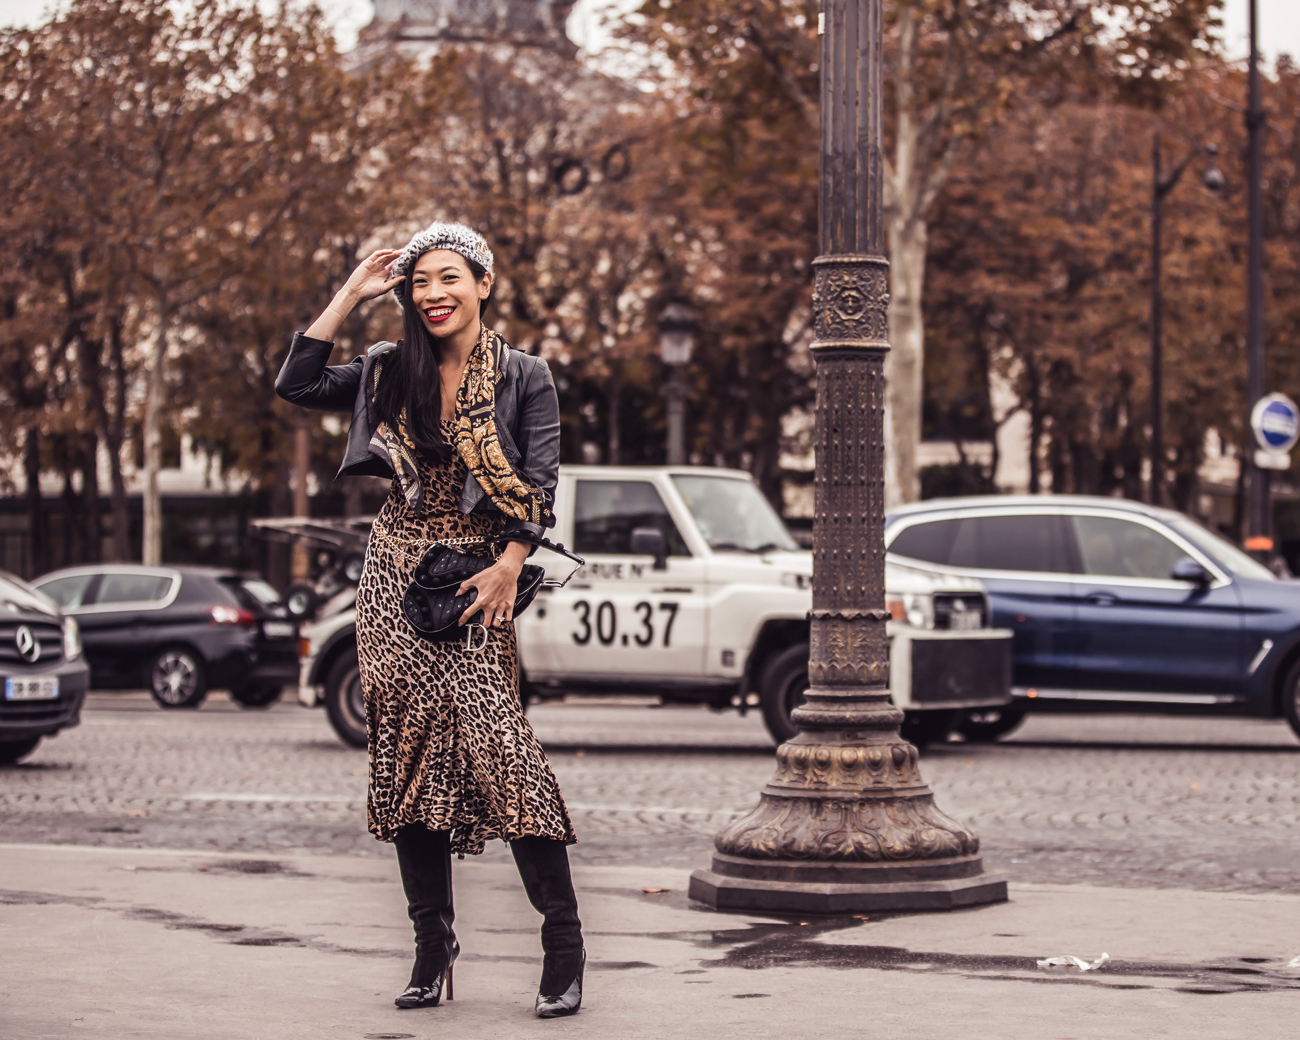 Paris Fashion Week Street Style Fall 2018 #Street #Fashion #Blog #Blogger #pfw #pfw2018 #ss18 #fw18 #parisfashionweek dior #diorbag #diorsaddle #metallo #metallicdress #silverdress #statementheels #Paris #France #fashionblog #styleblog #streetstyle #bestoutfit #falloutfit #beststyle #stylishoutfit #fallfashion #fallstyle #outfitinspo #outfitinspiration #outfitideas #leoparddress #versace #gianniversace #vintageversace #leopard #animalprint #fallfashion #kneeboots #beret #manoloblahnik